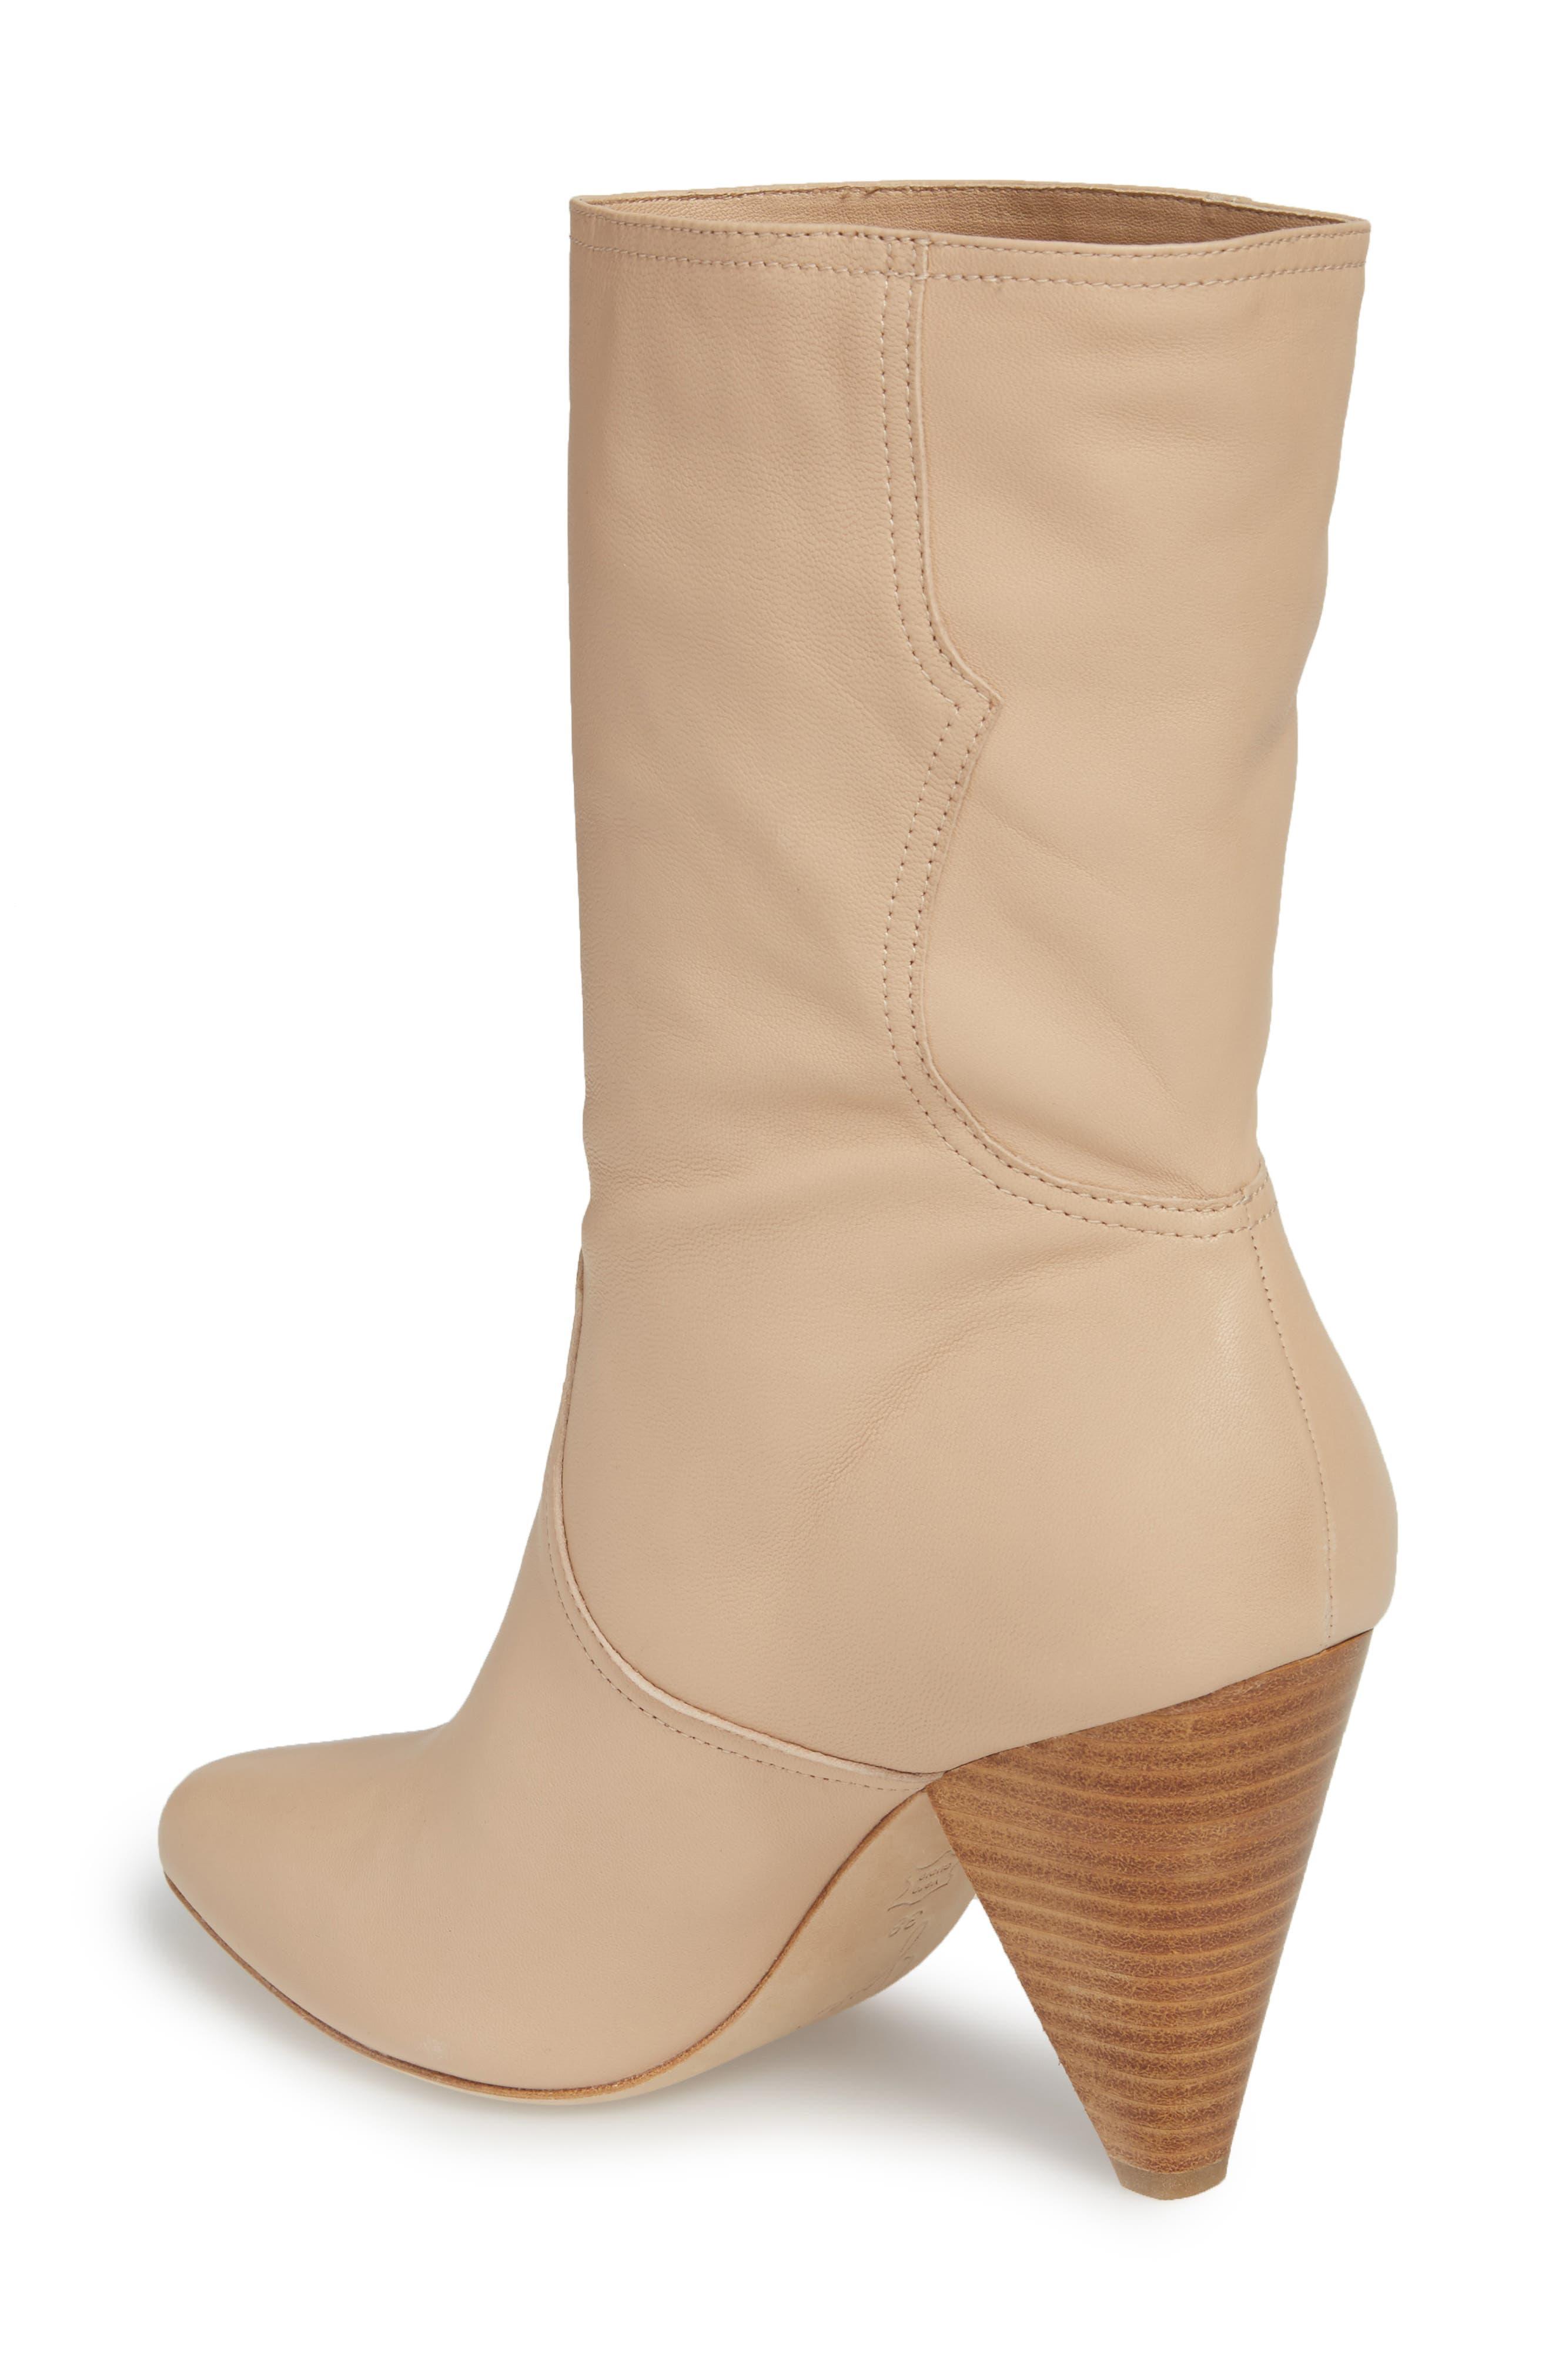 Gabbissy Almond Toe Boot,                             Alternate thumbnail 2, color,                             BLUSH